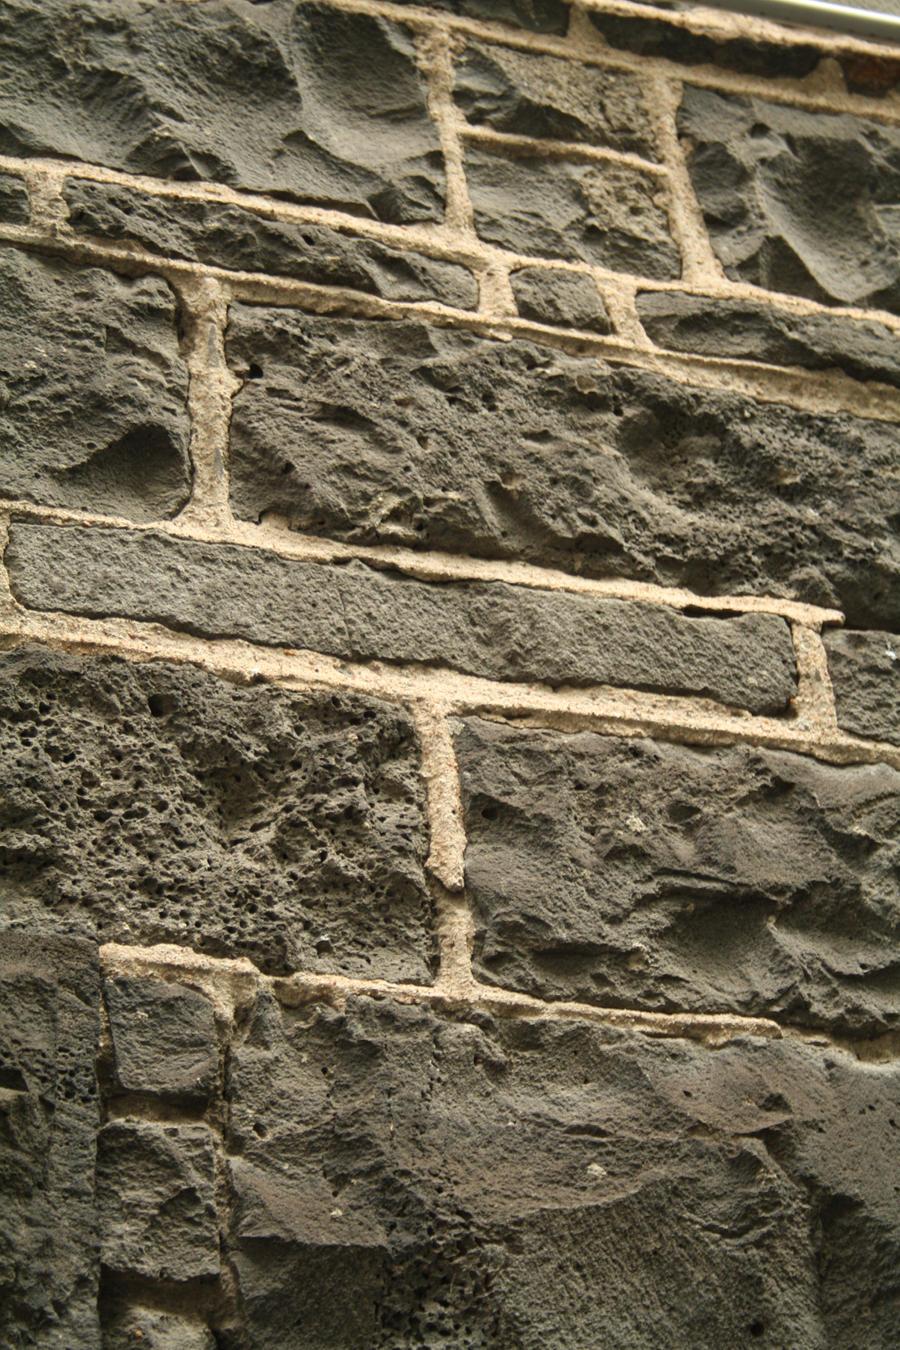 Brick Texture II by FreeakStock